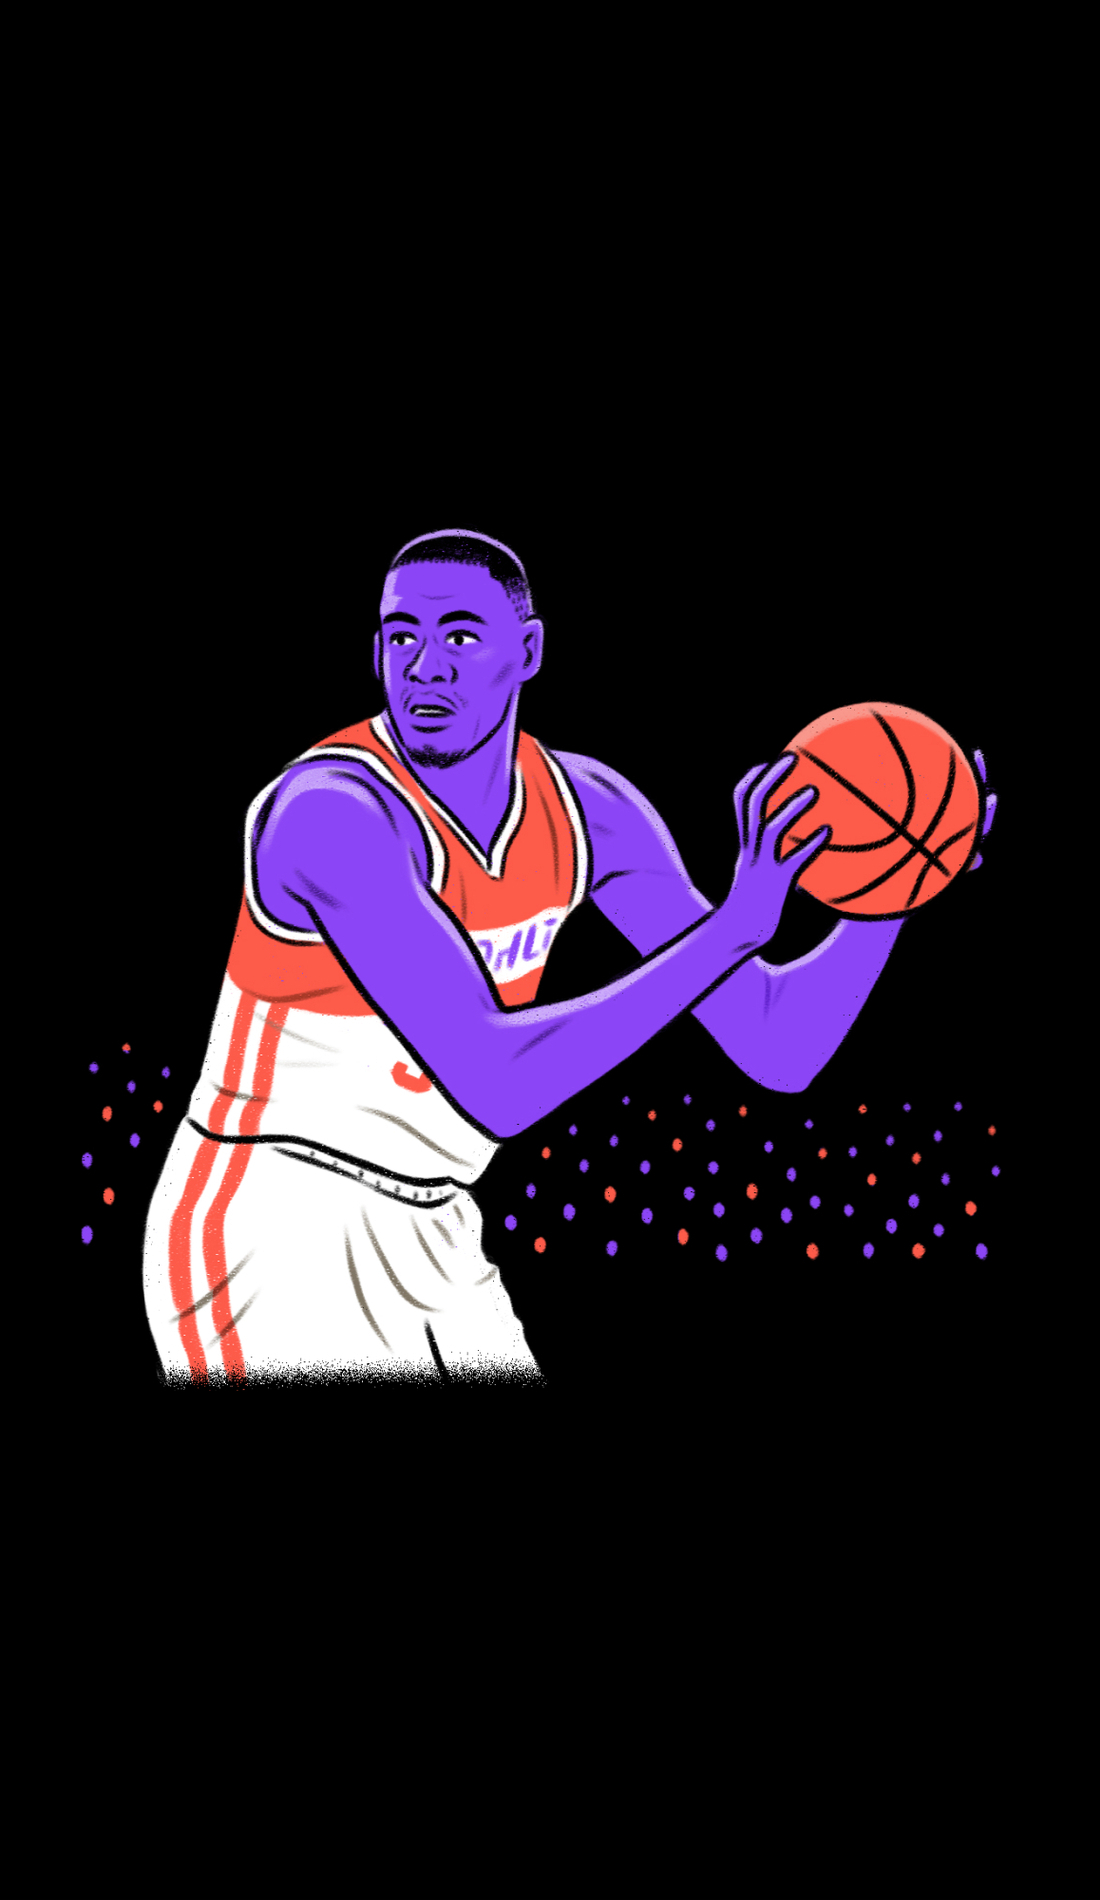 A Utah Utes Basketball live event